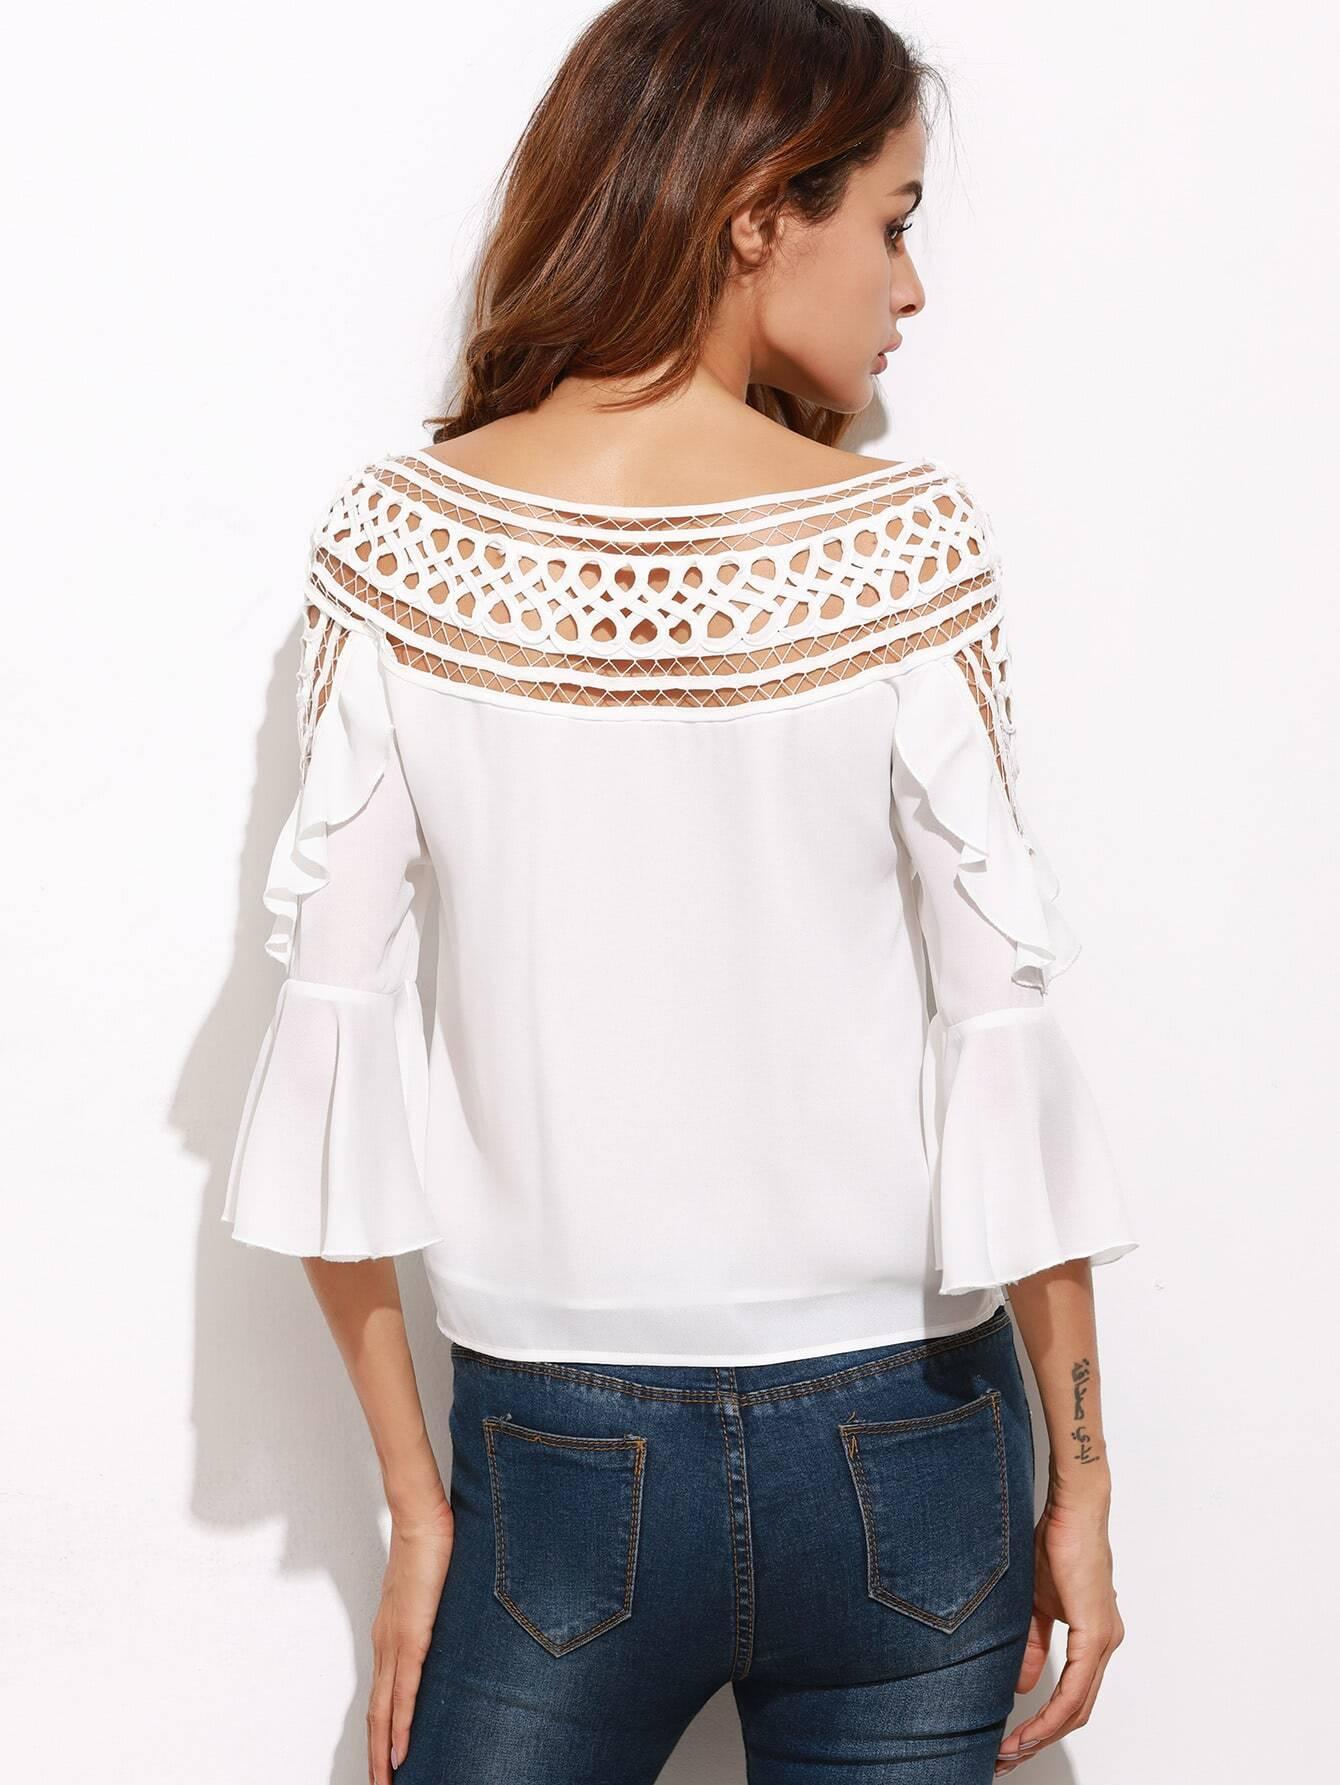 blouse160922703_2